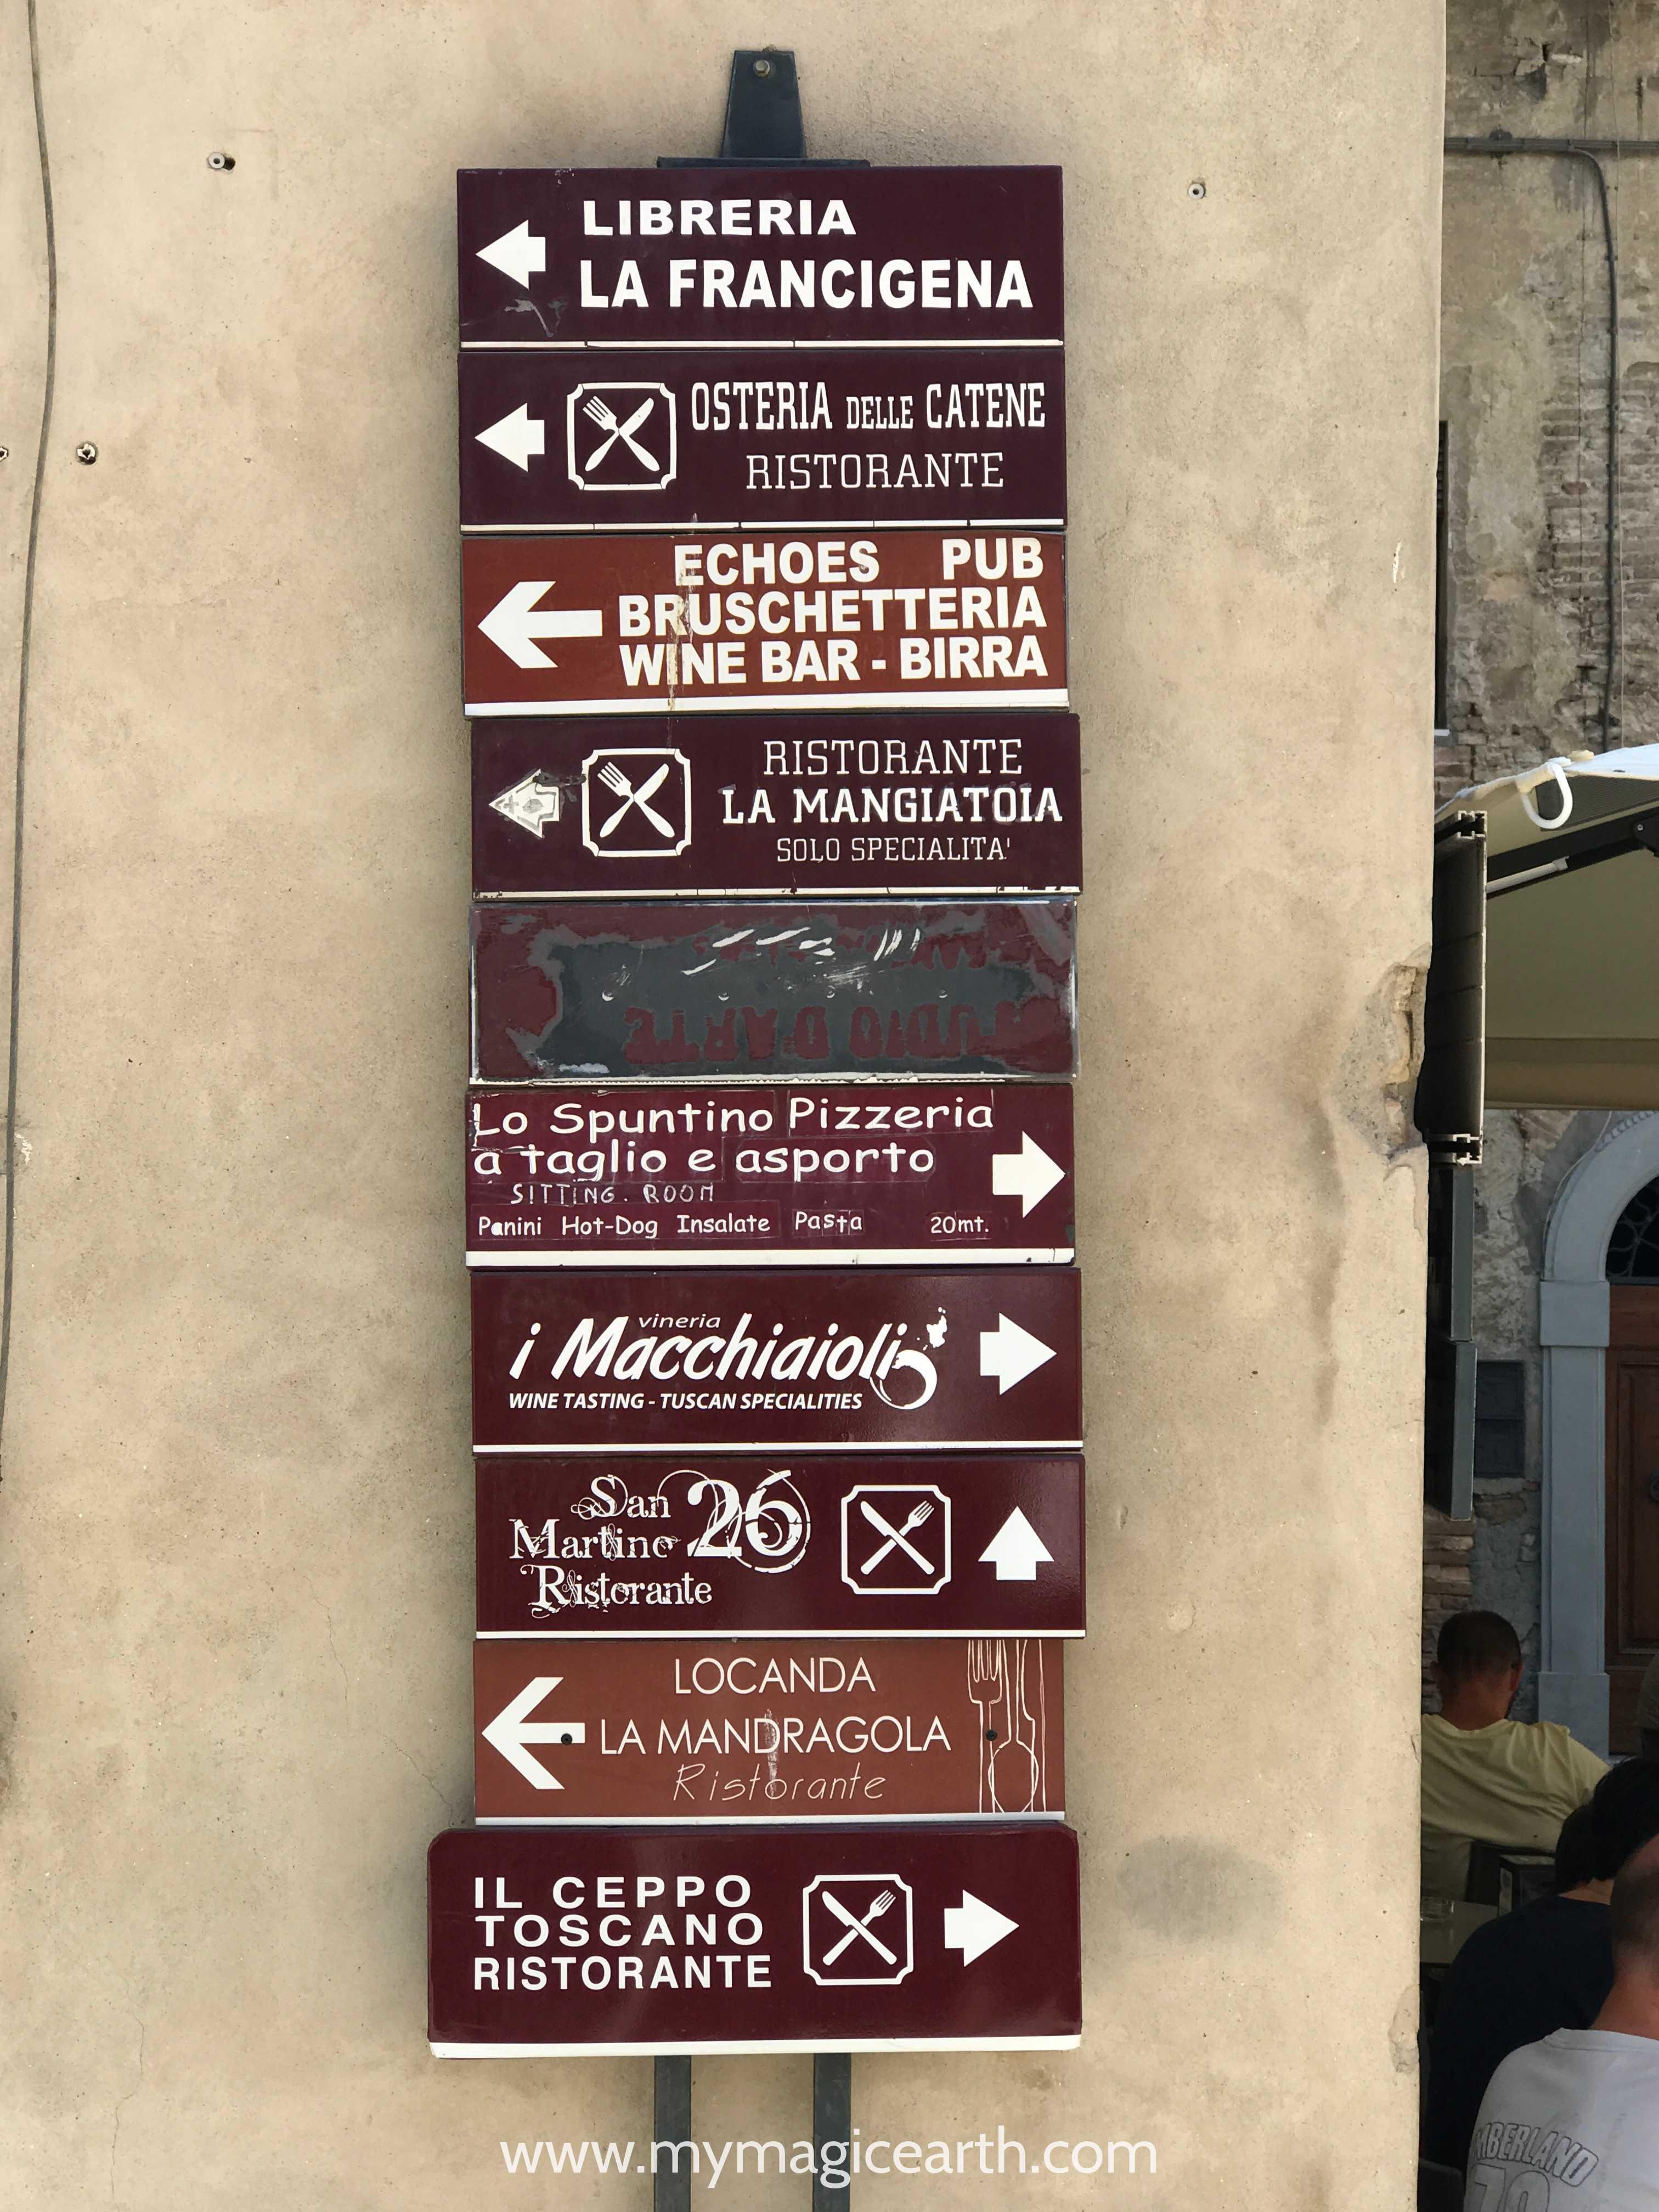 Restaurant names in San Gimigiano, Tuscany